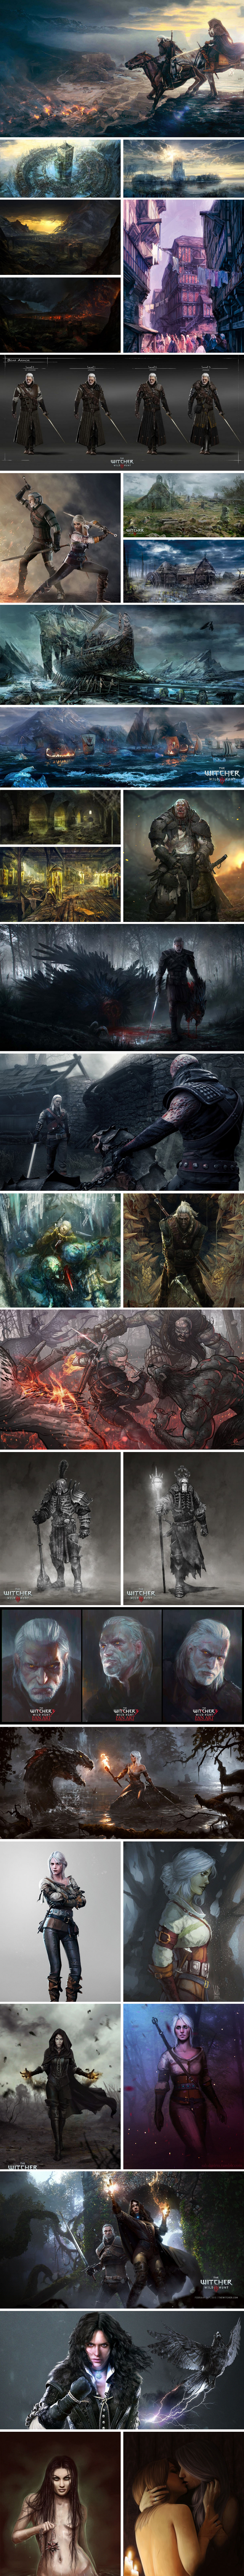 The Witcher 3 vol 1 подборка артов